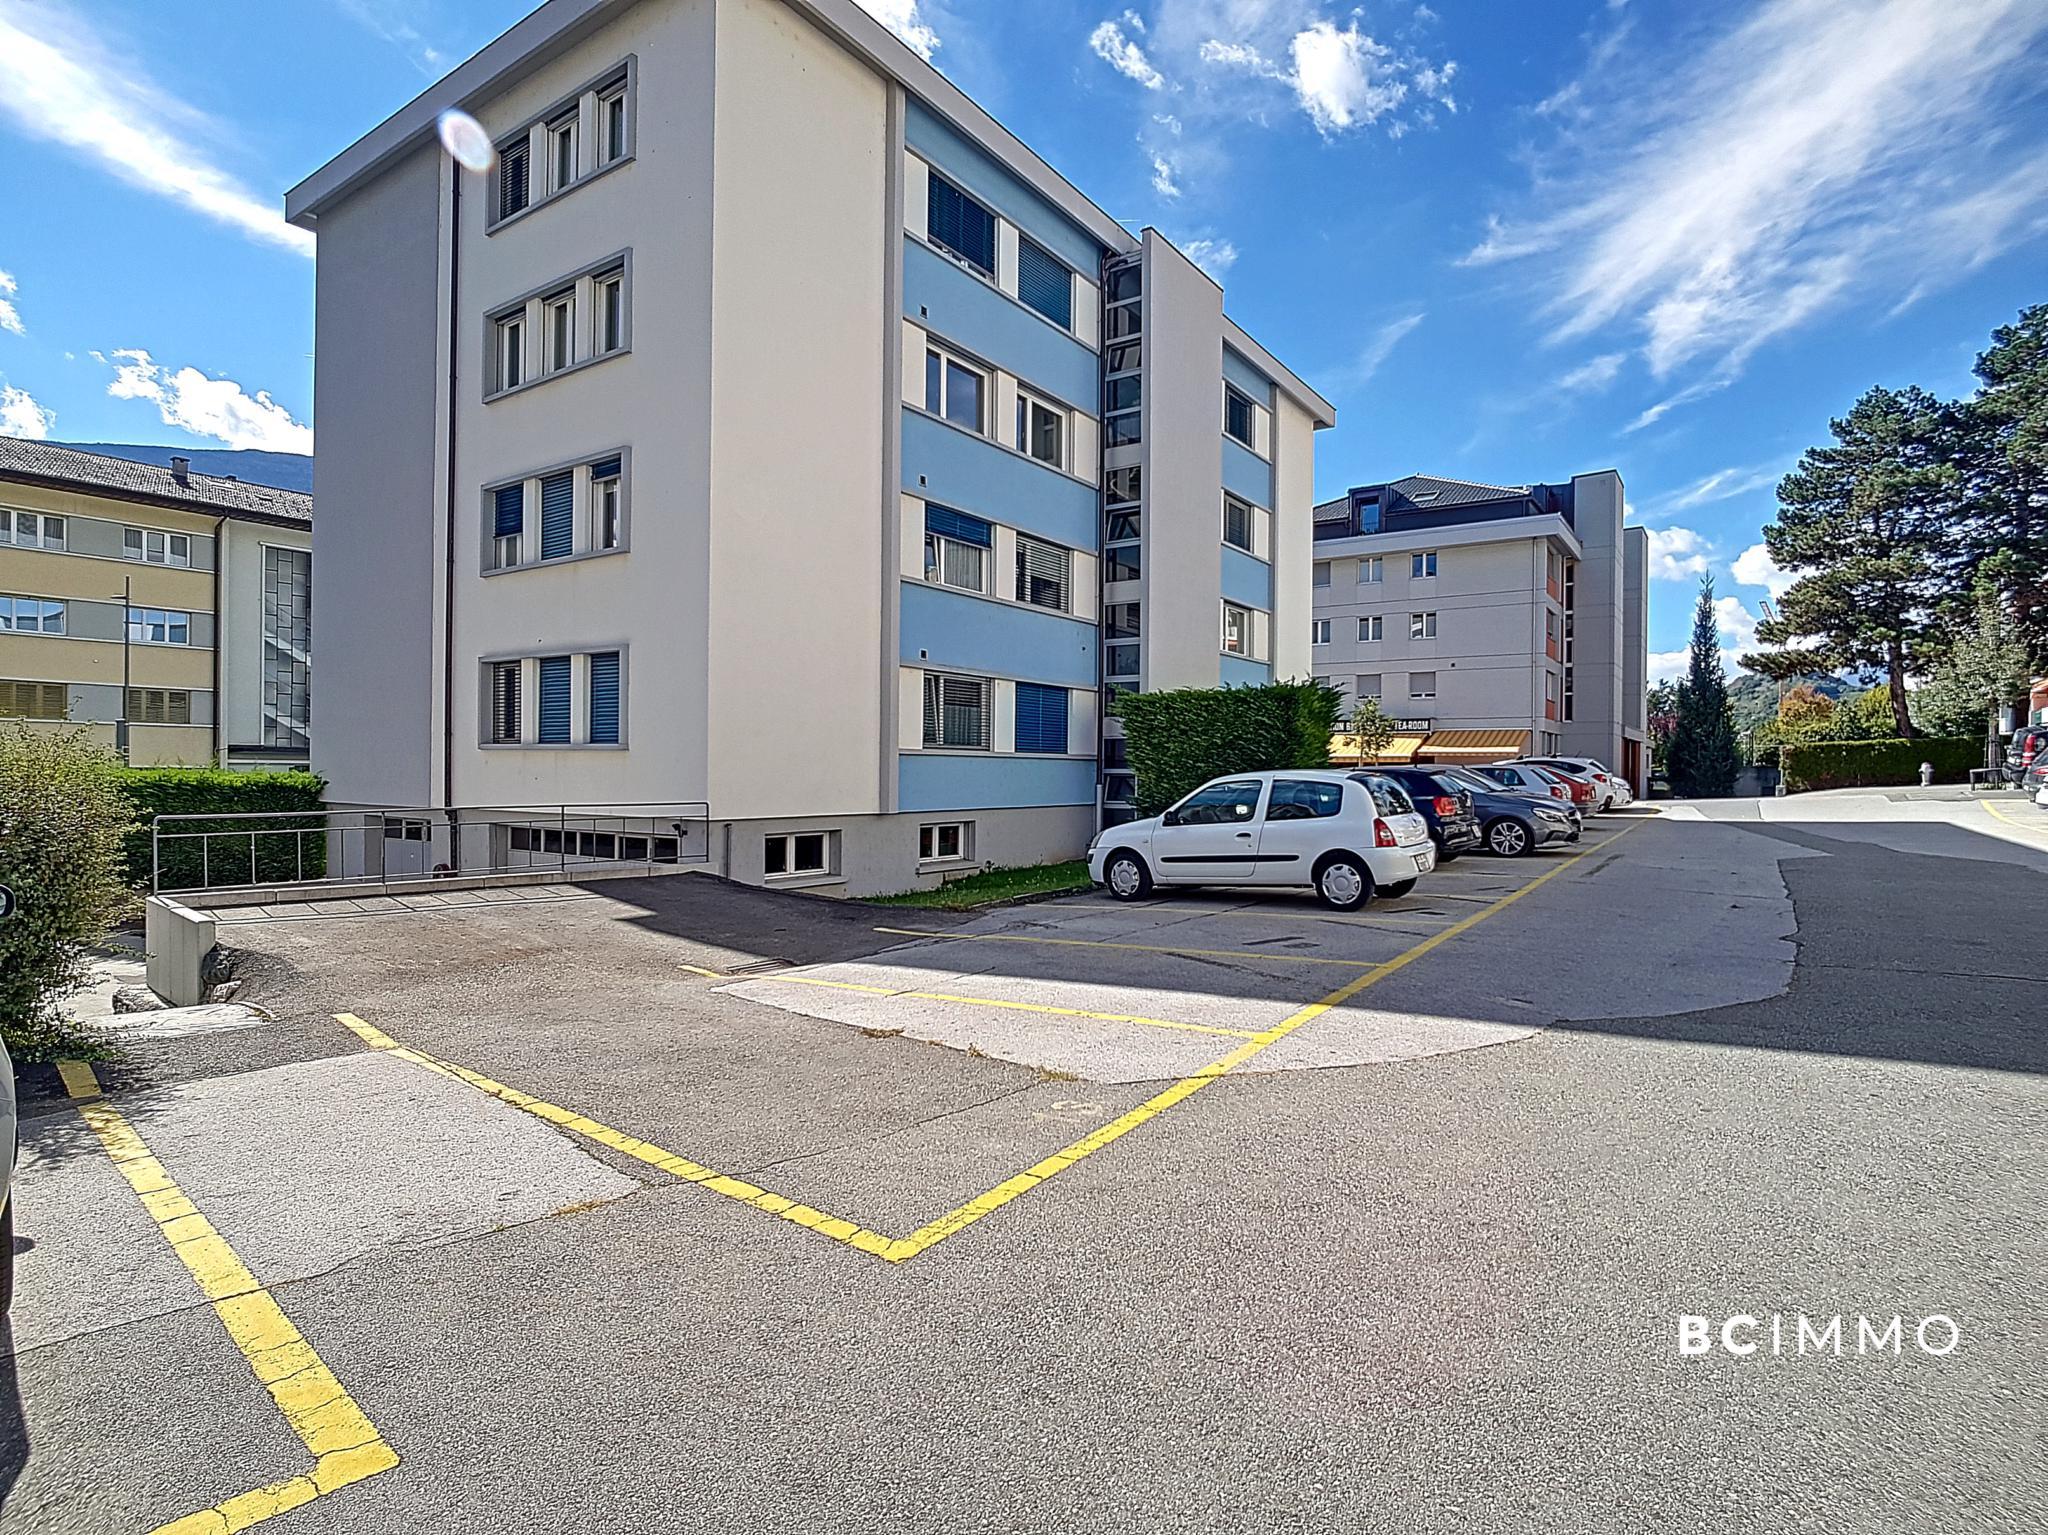 BC Immo - Charmant appartement de 3.5 pièces  - DCPCA50